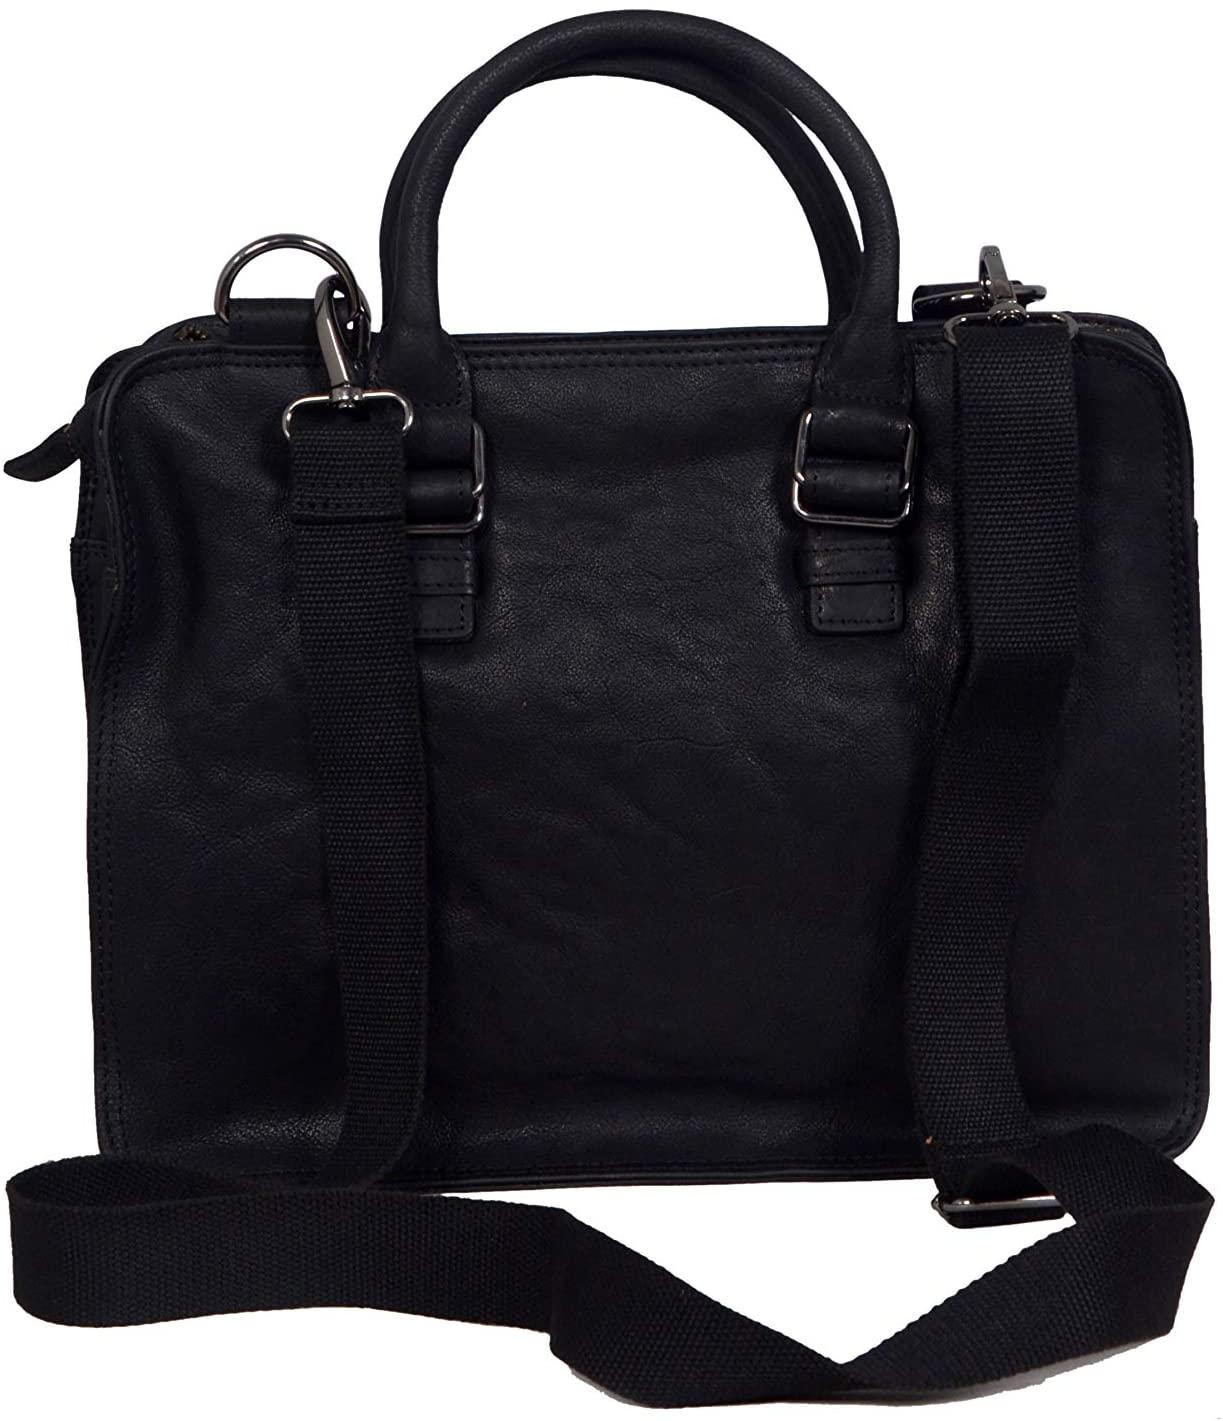 ZINT Men's Genuine Leather Briefcase Laptop Bag/Messenger Bag/Portfolio Bag (Black)